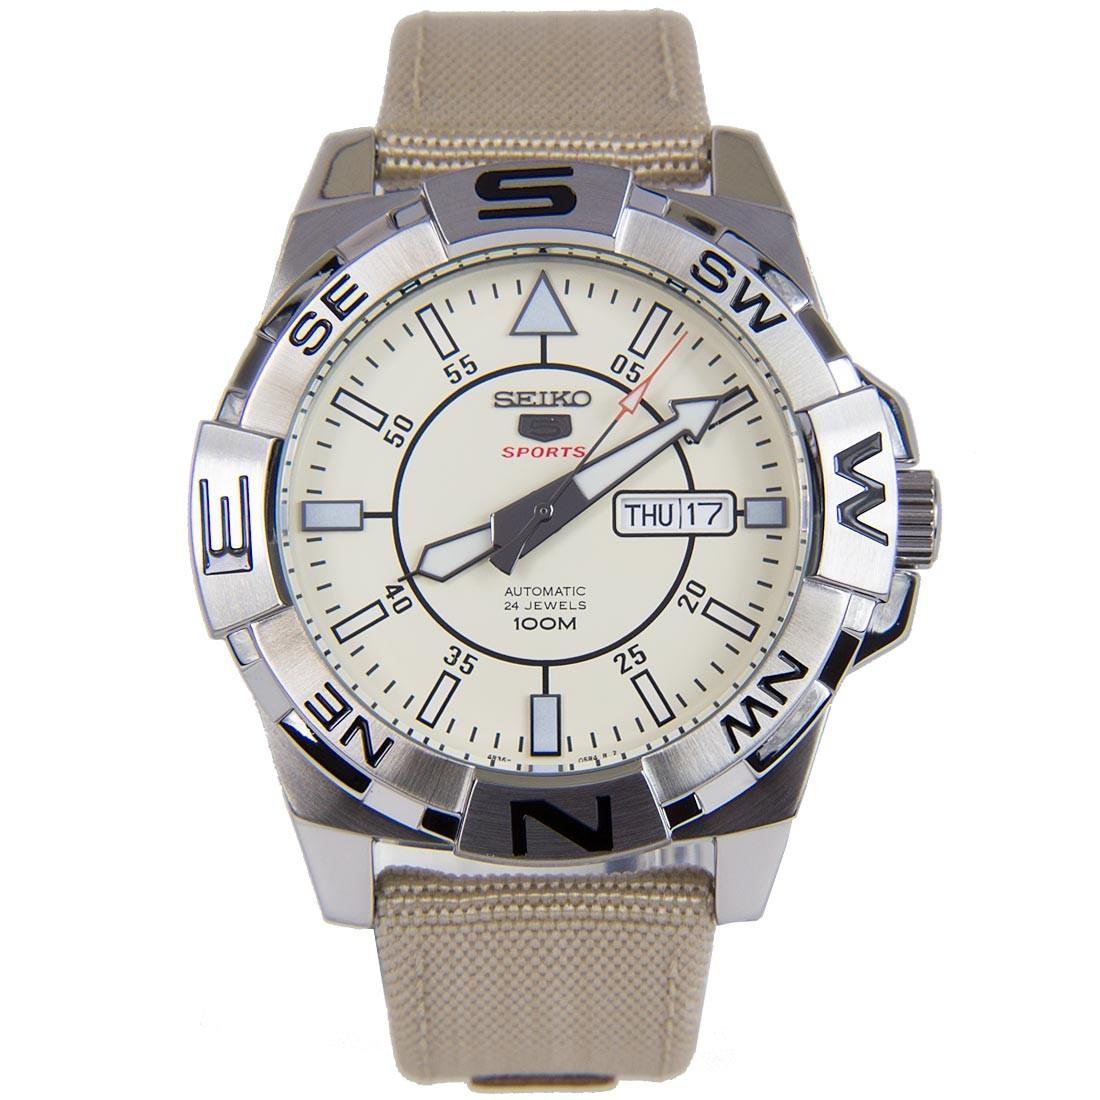 Swatch chrono automatic описание